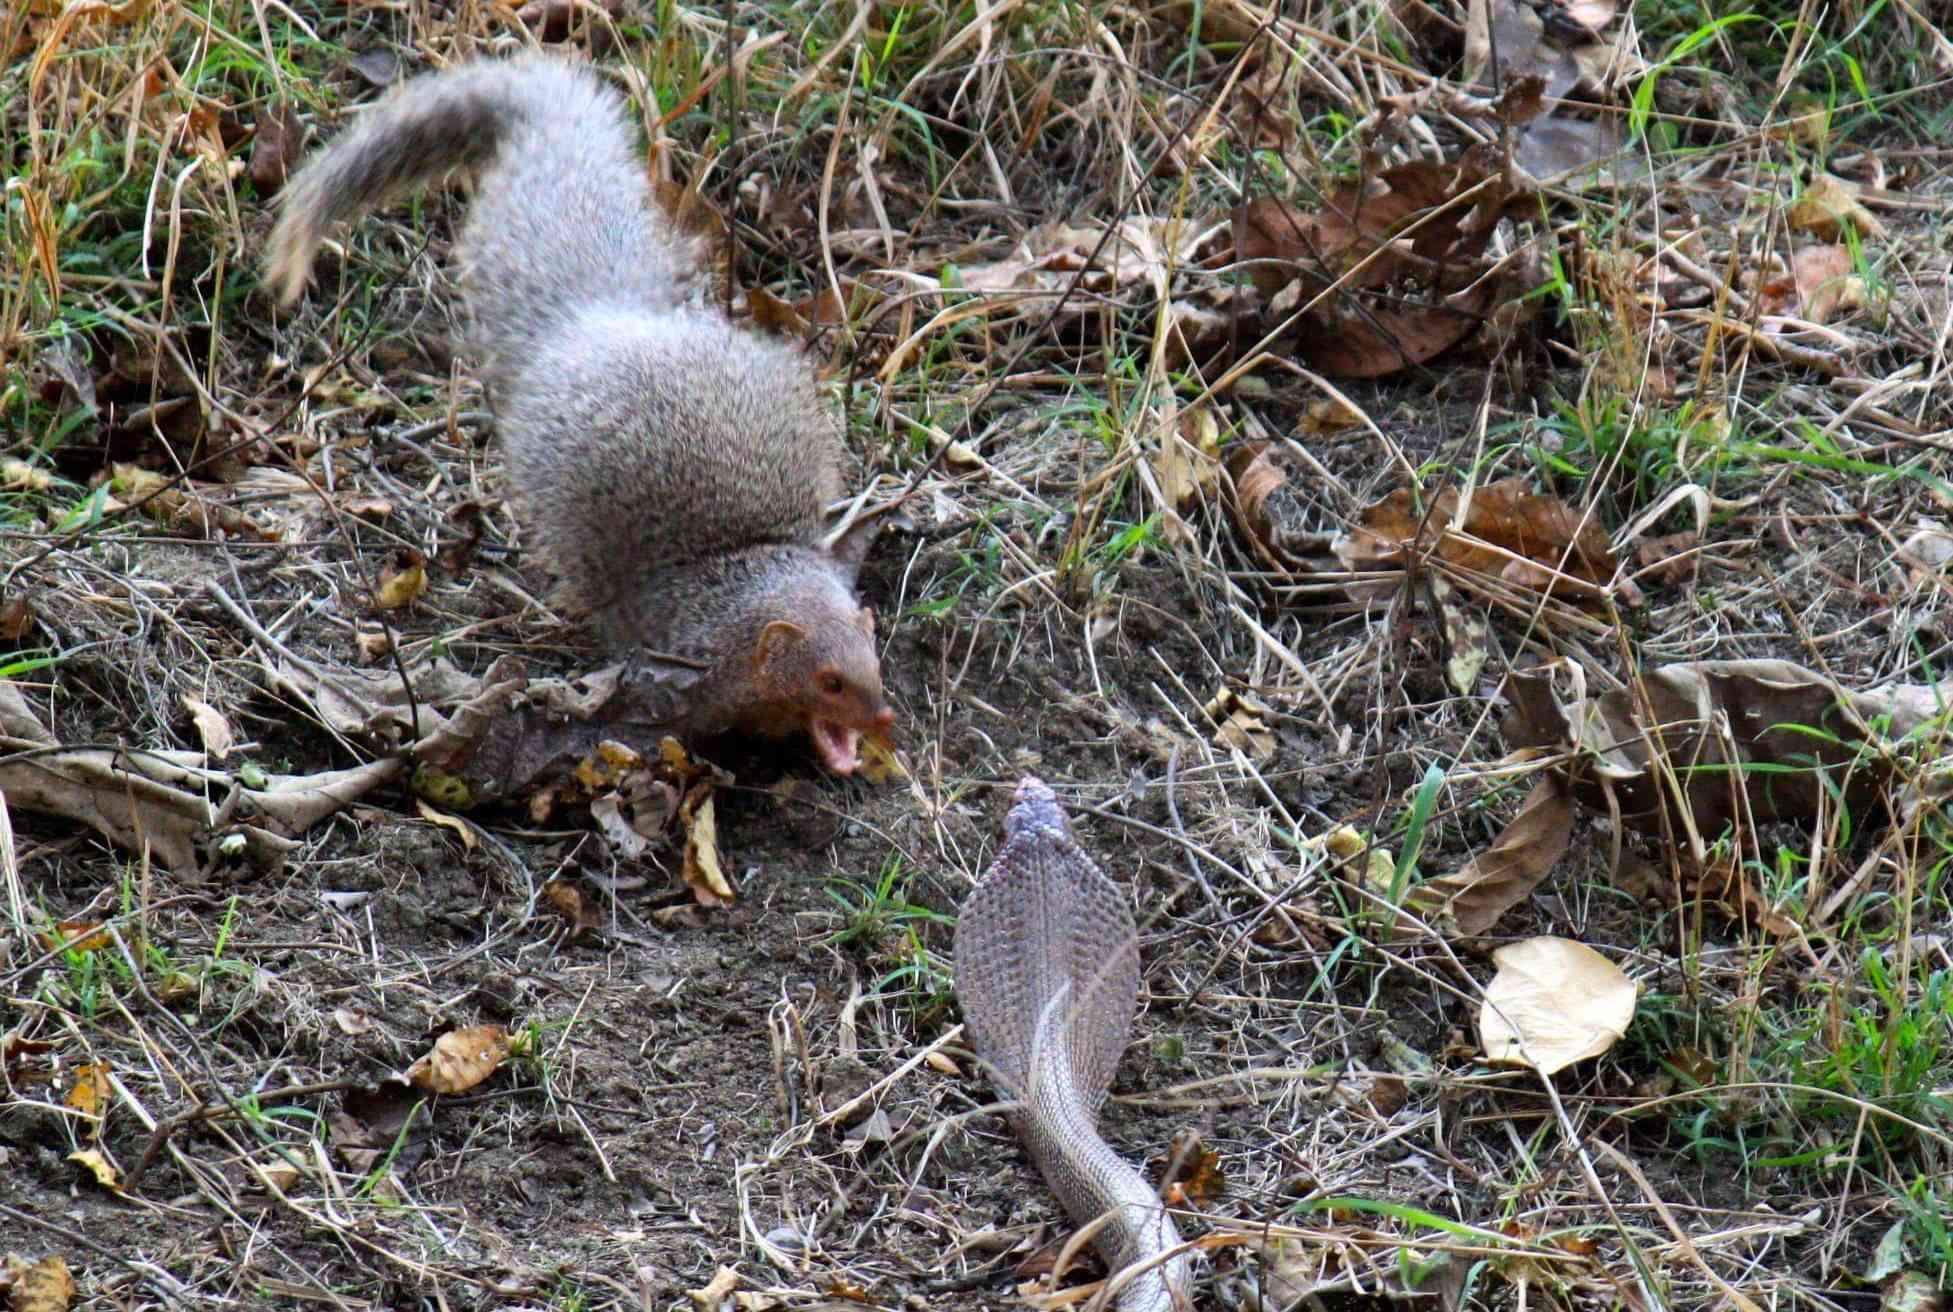 A mongoose confronts a cobra.